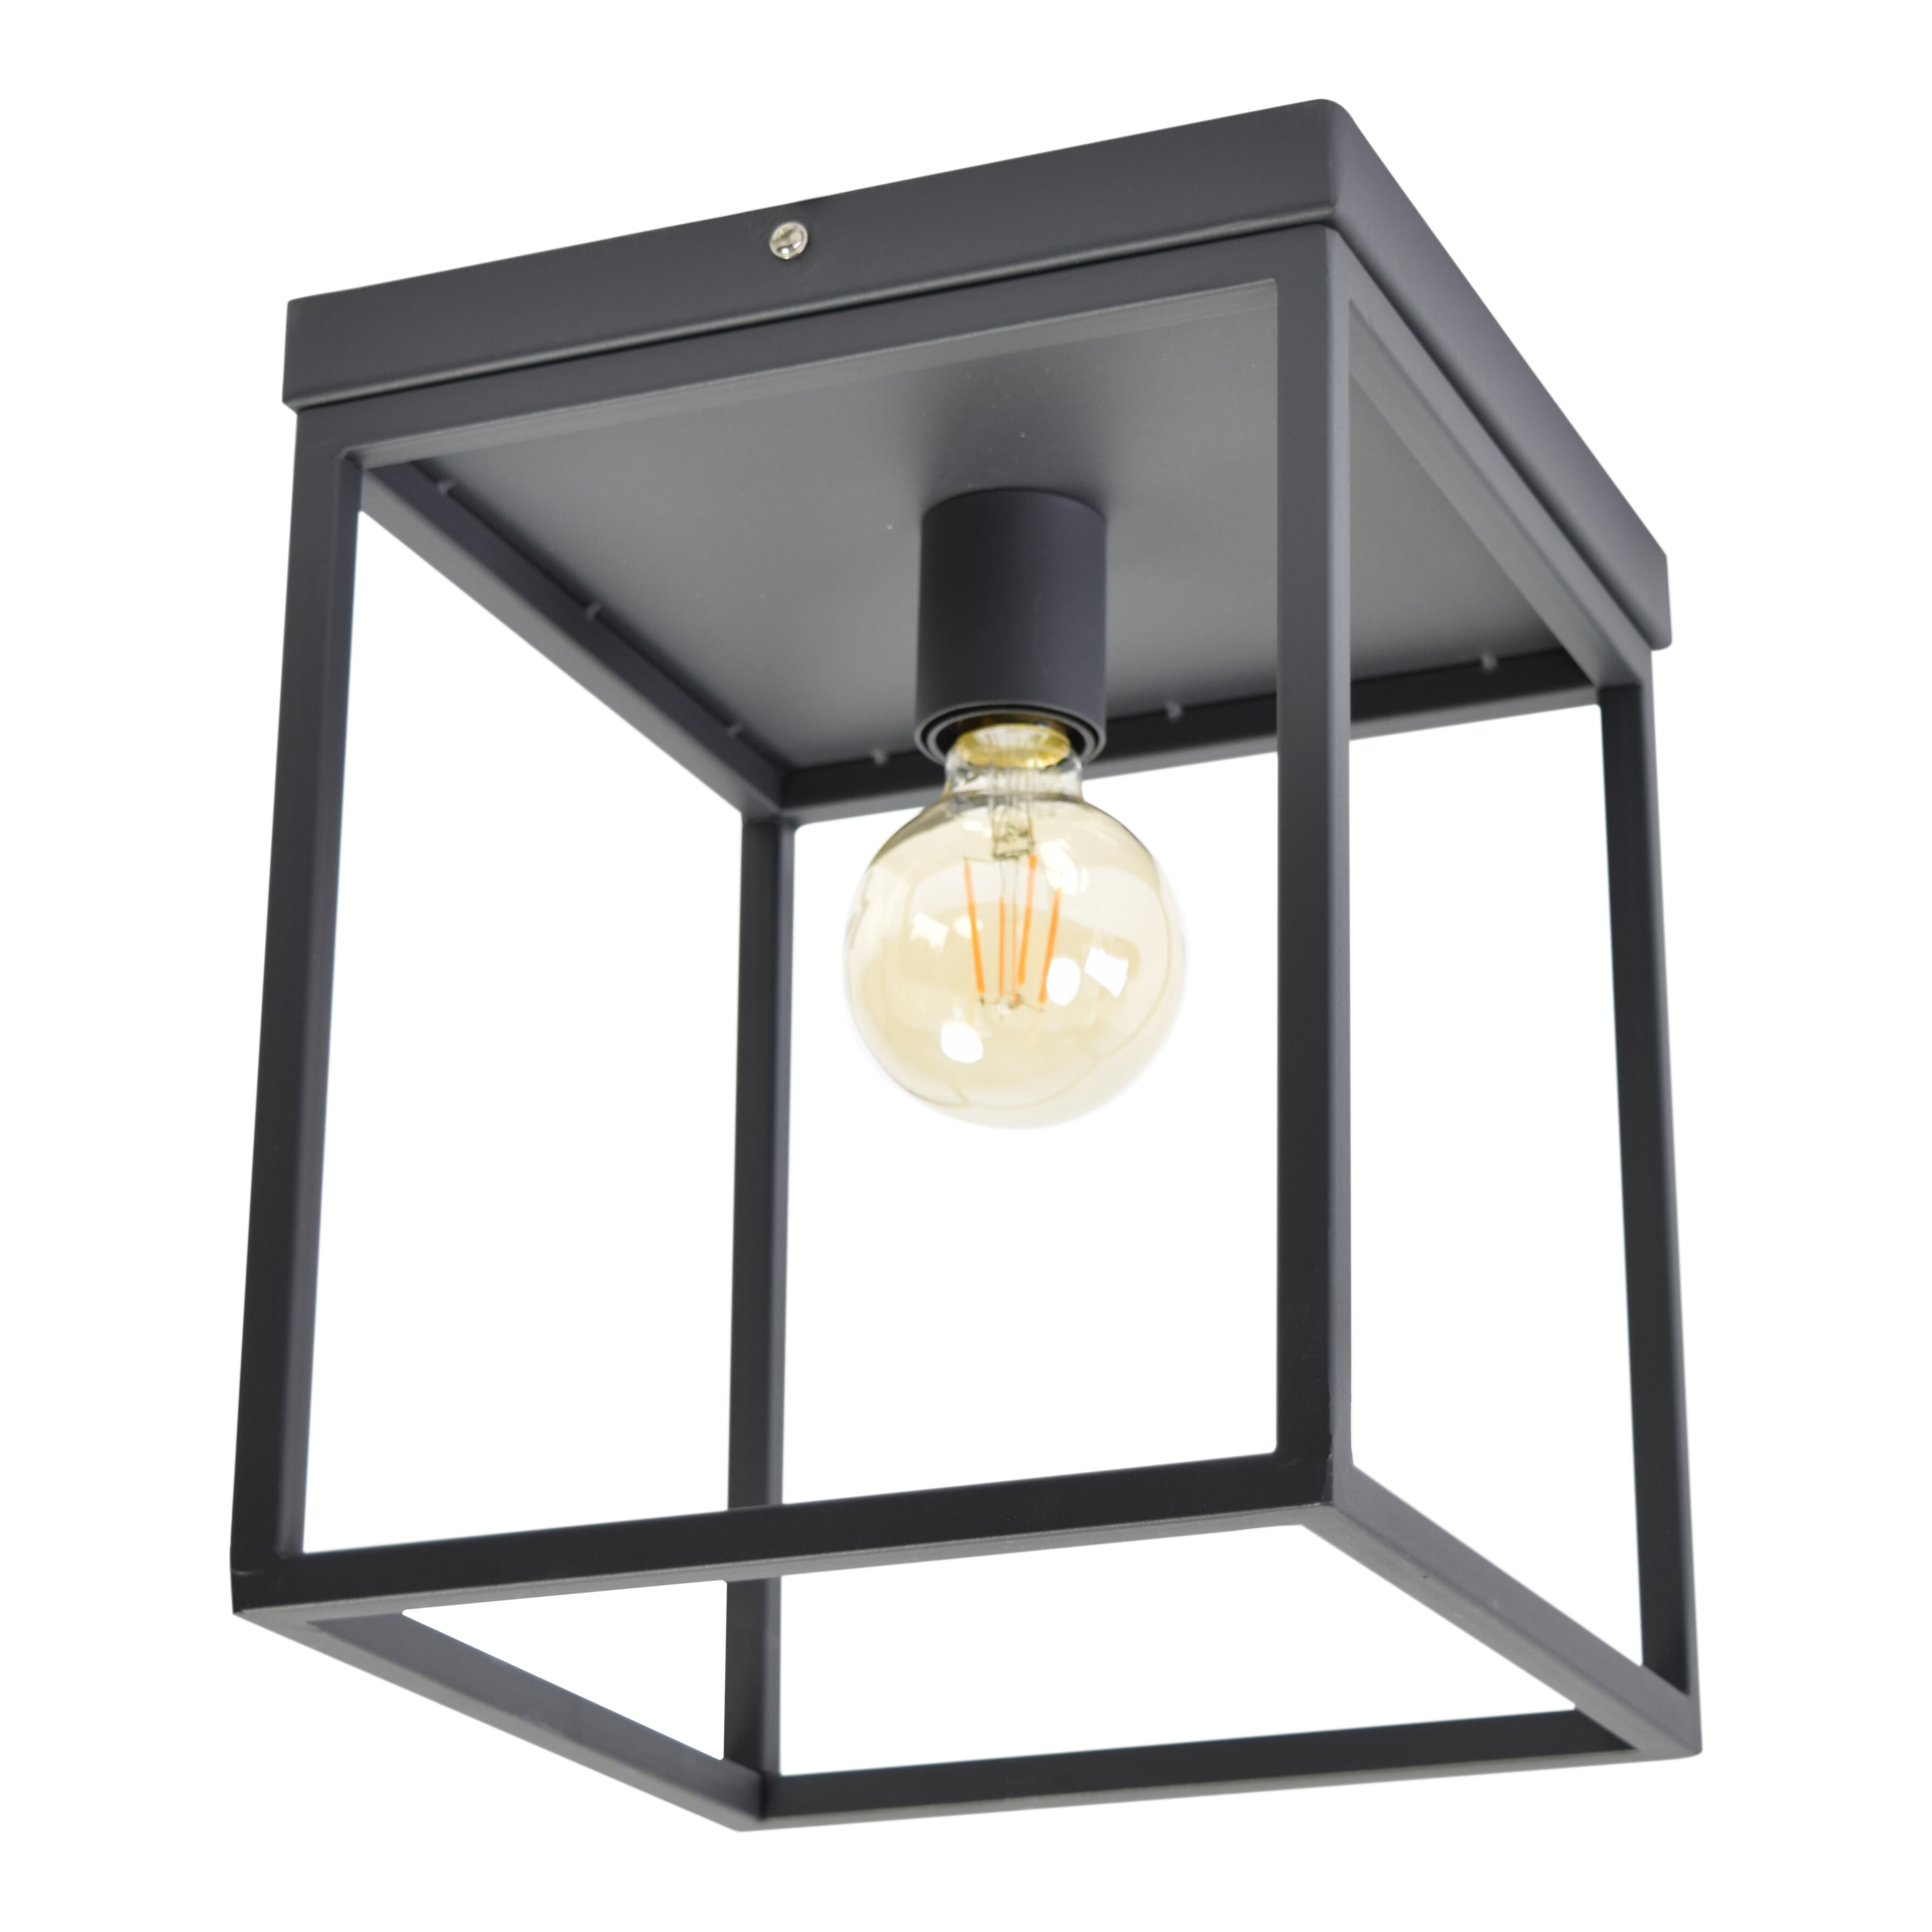 Urban Interiors plafondlamp 'Frame', kleur Zwart